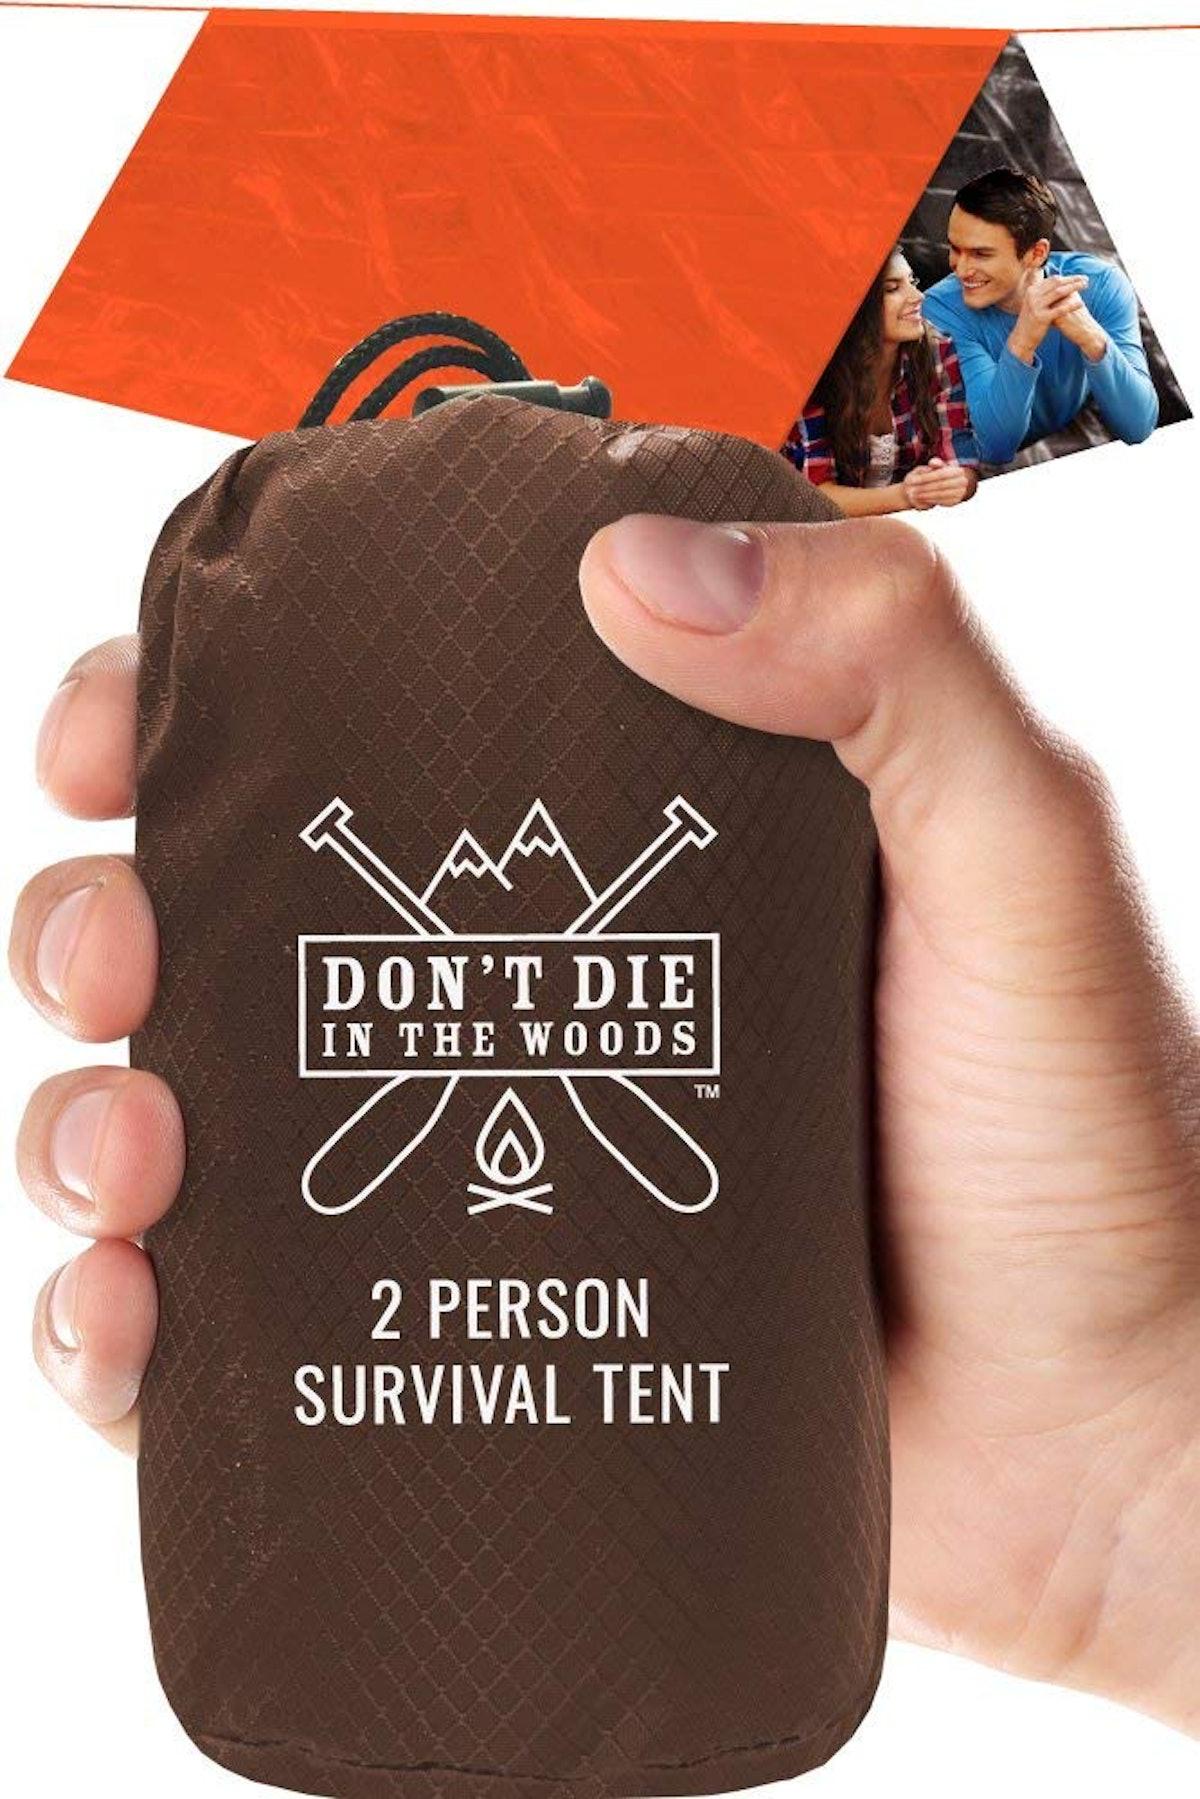 World's Toughest Ultralight Survival Tent